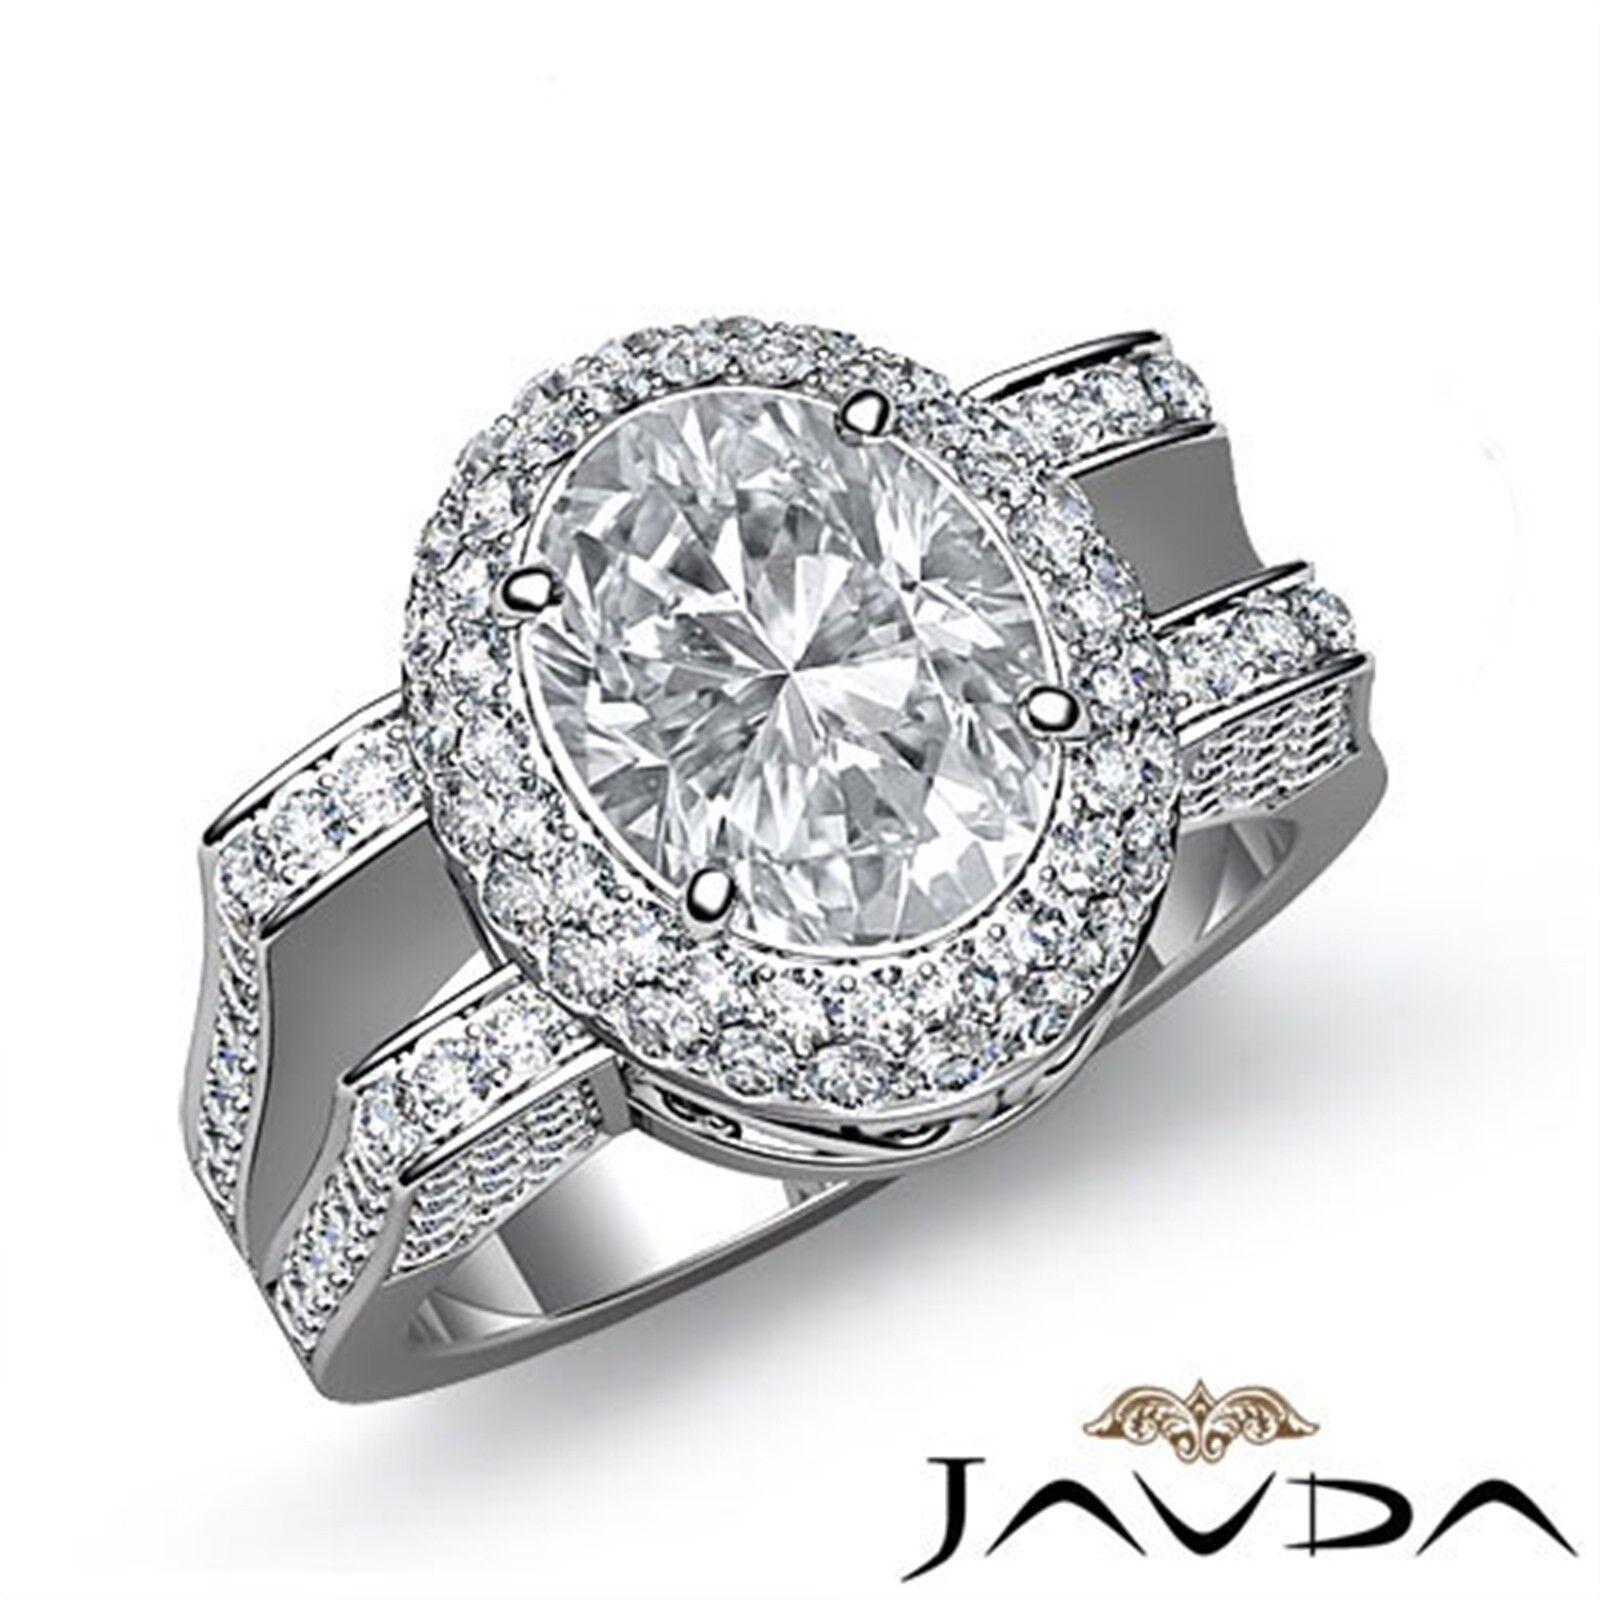 2.3ctw Gala Halo Split Shank Oval Diamond Engagement Ring GIA E-VVS2 White Gold